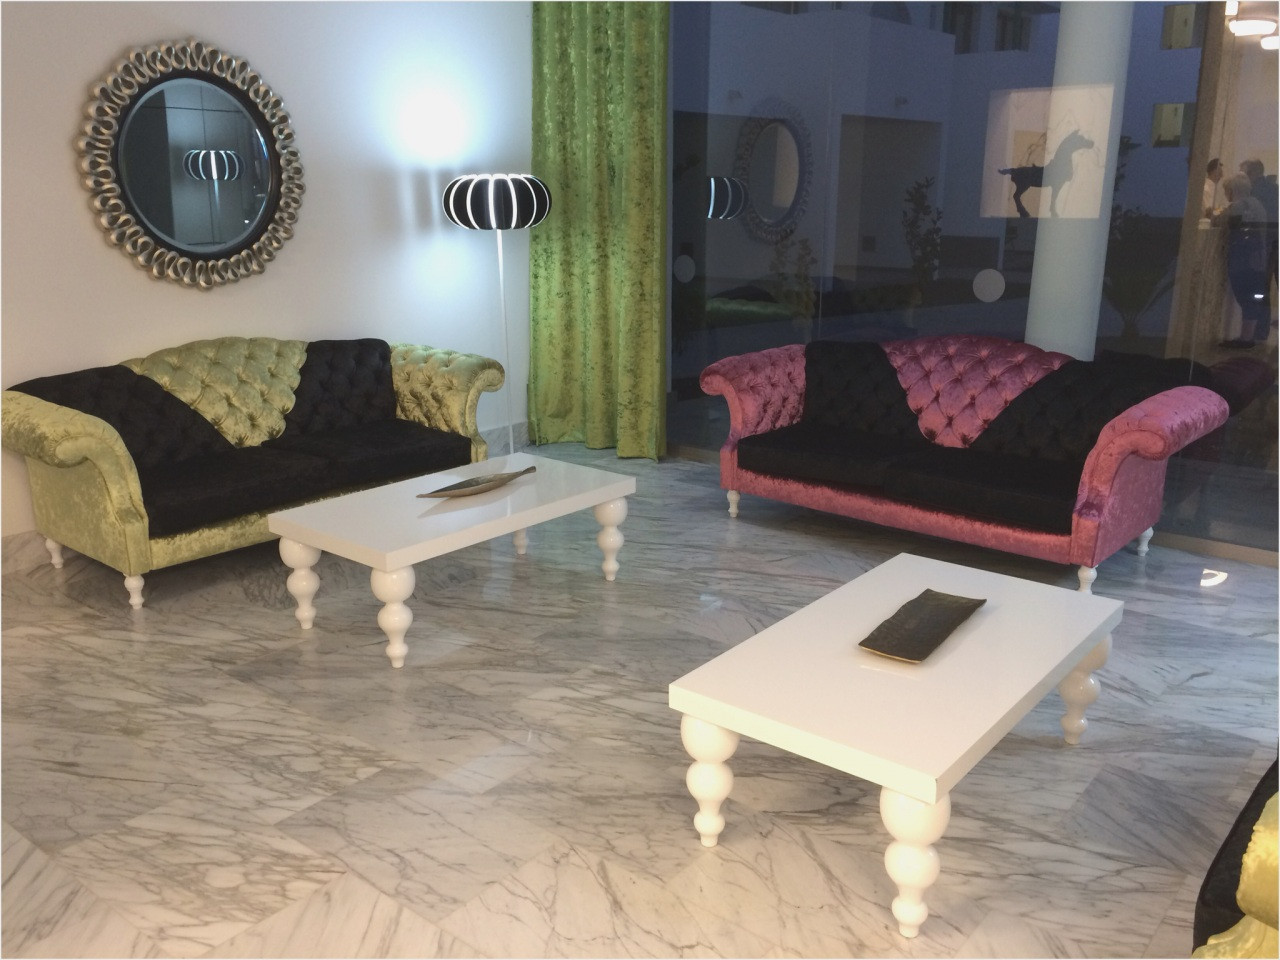 Sofa Mehrzahl  Recamiere Herkunft Einzigartig 15 Sofa Mehrzahl — Inneres